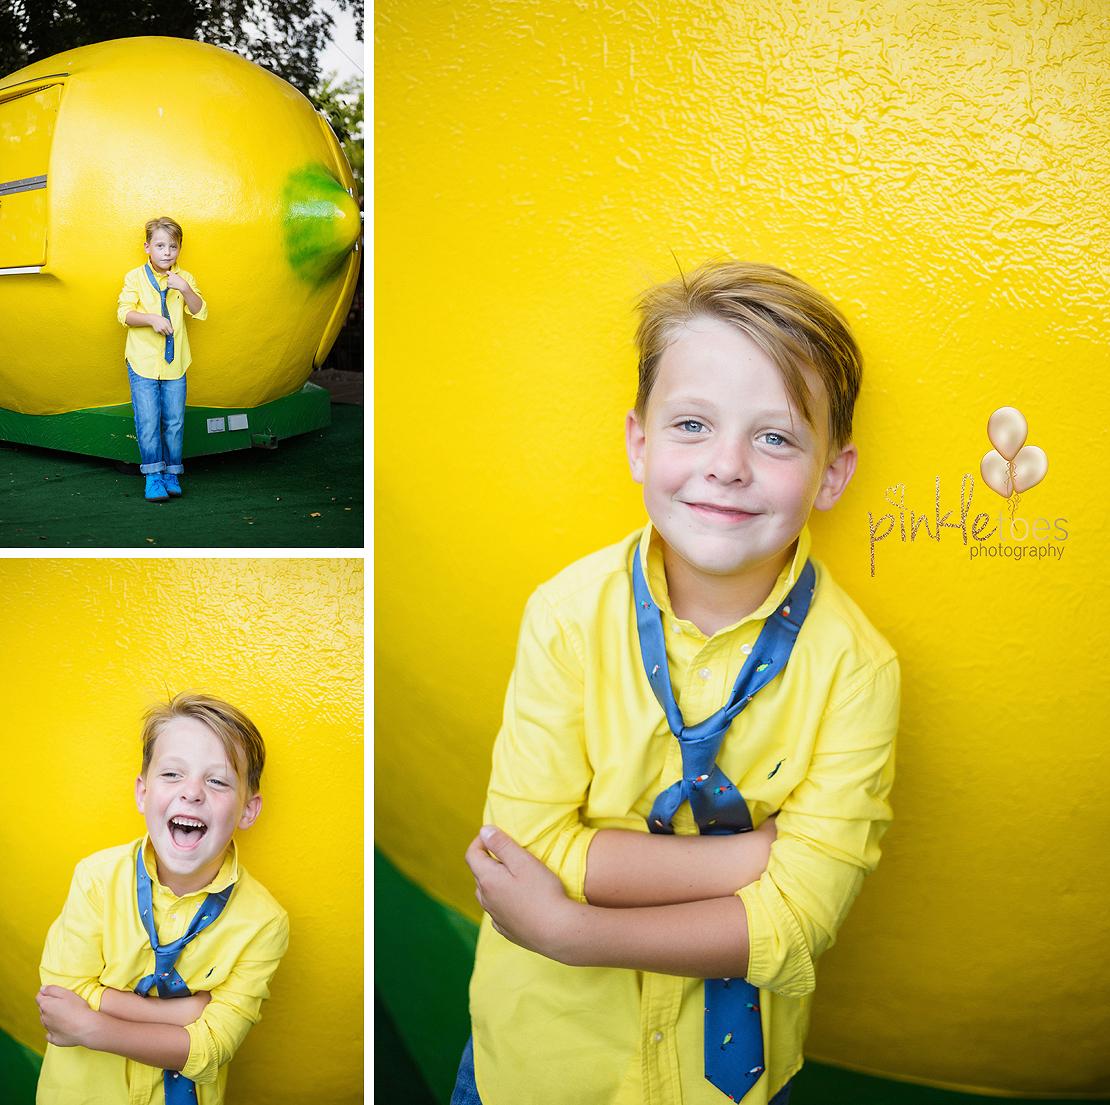 south-congress-austin-child-photo-shoot-013